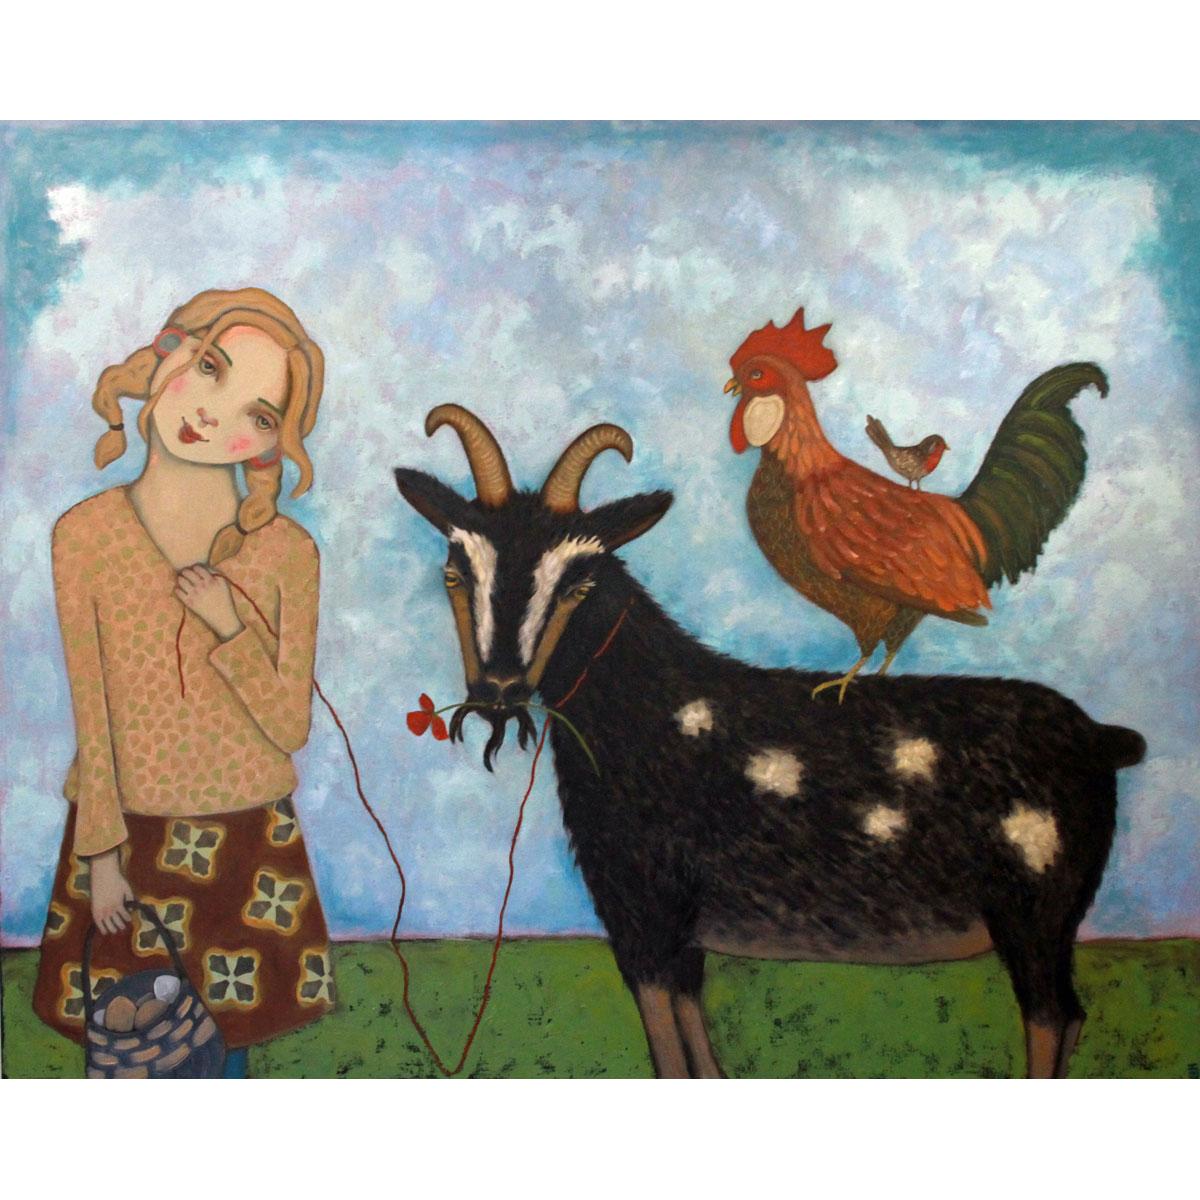 Billy by Heather Barron